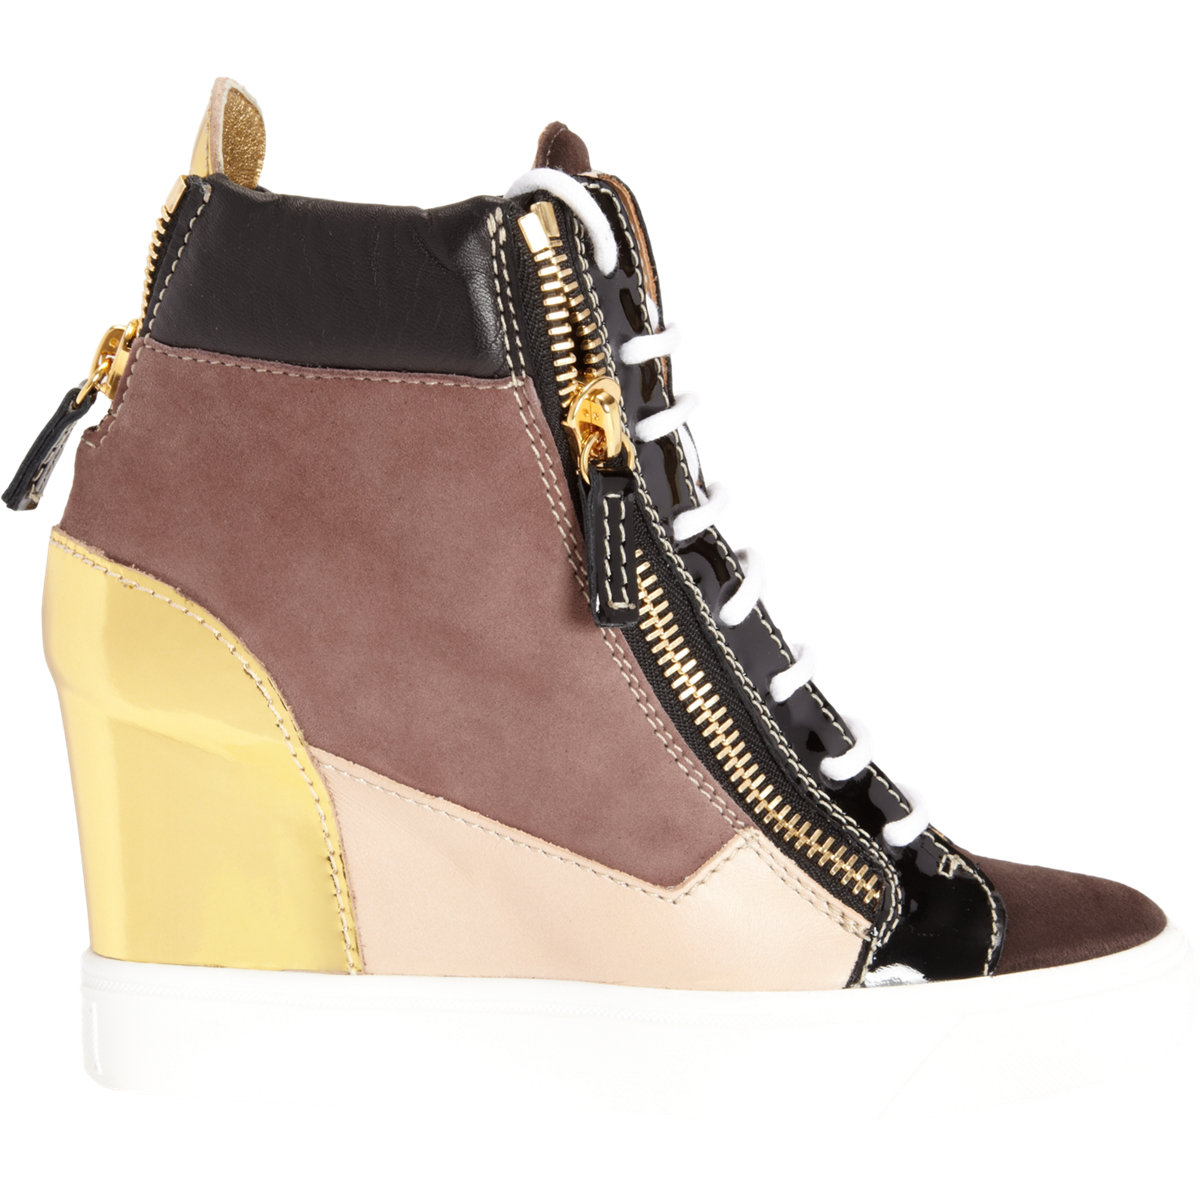 Giuseppe Zanotti Colorblock Zip Wedge Sneaker in Brown | Lyst